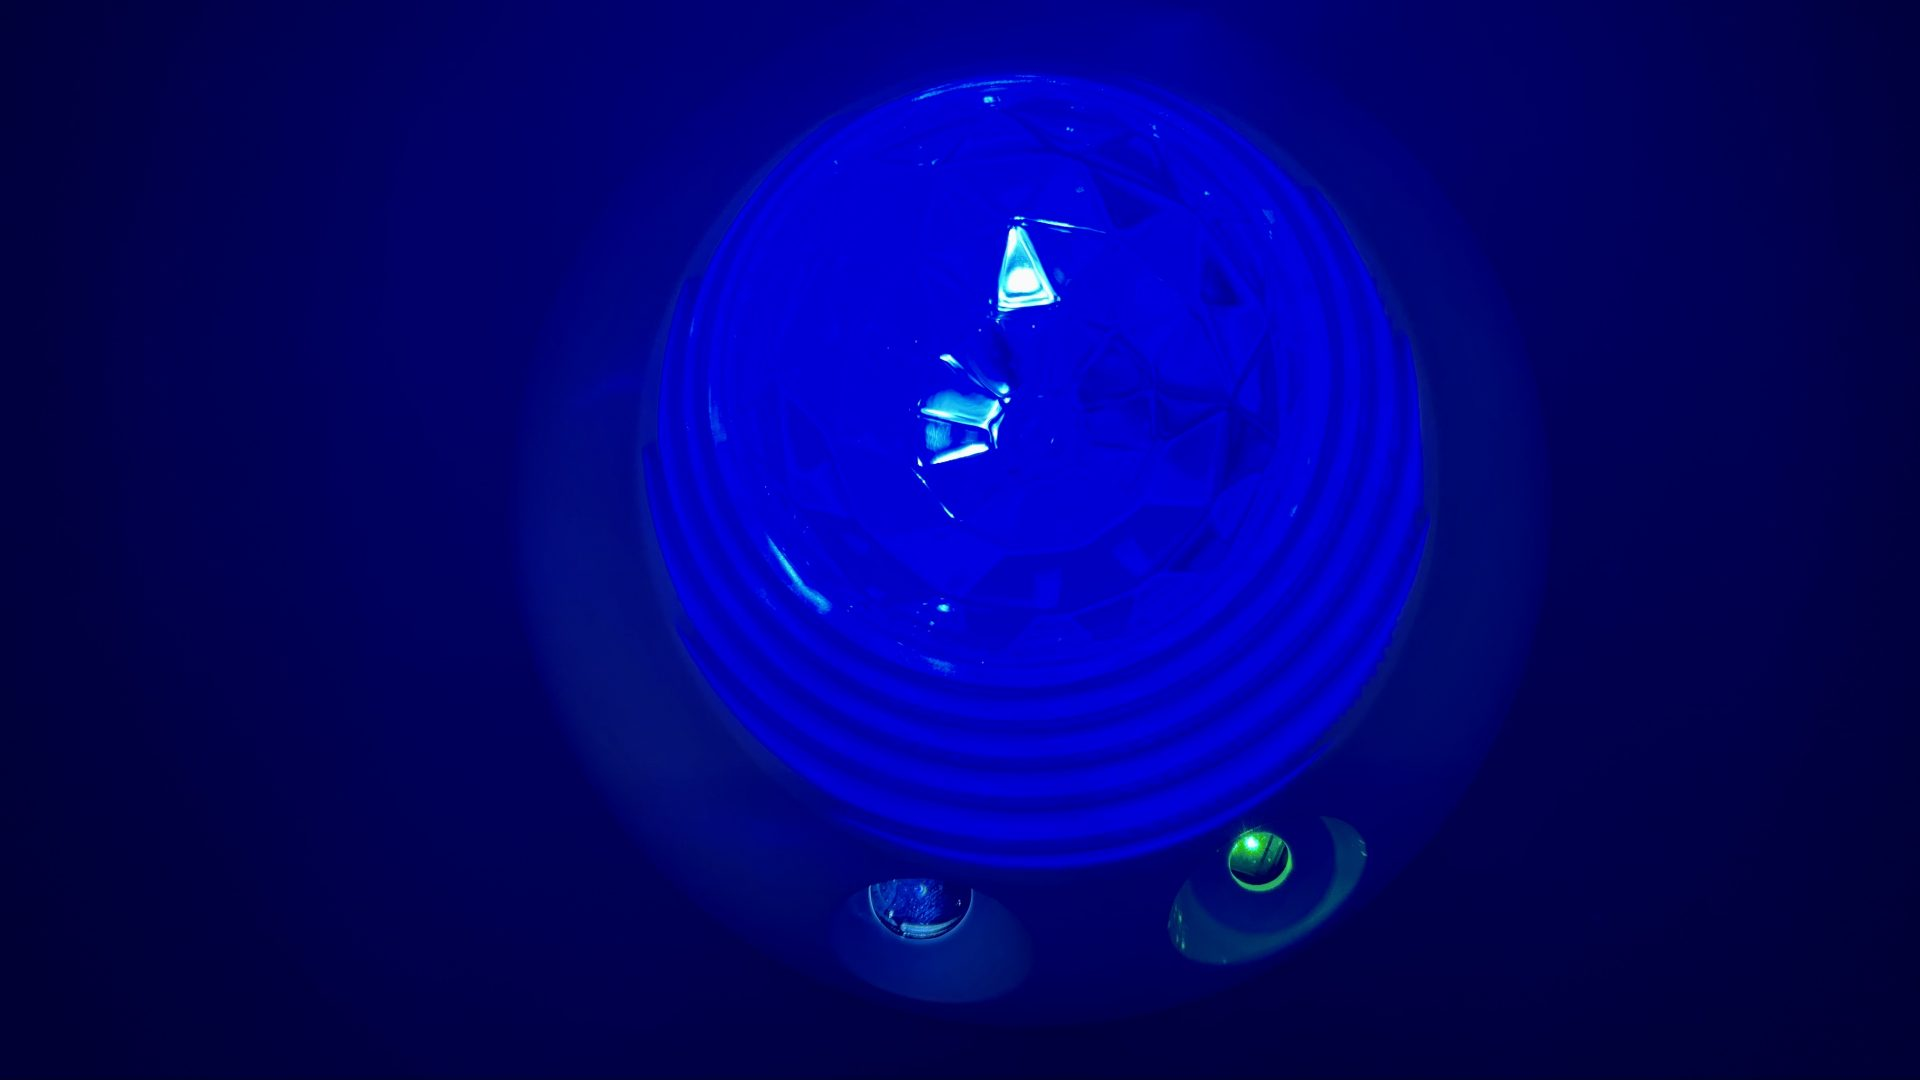 Review: Ihoomee Galaxy Star Projector Night Light